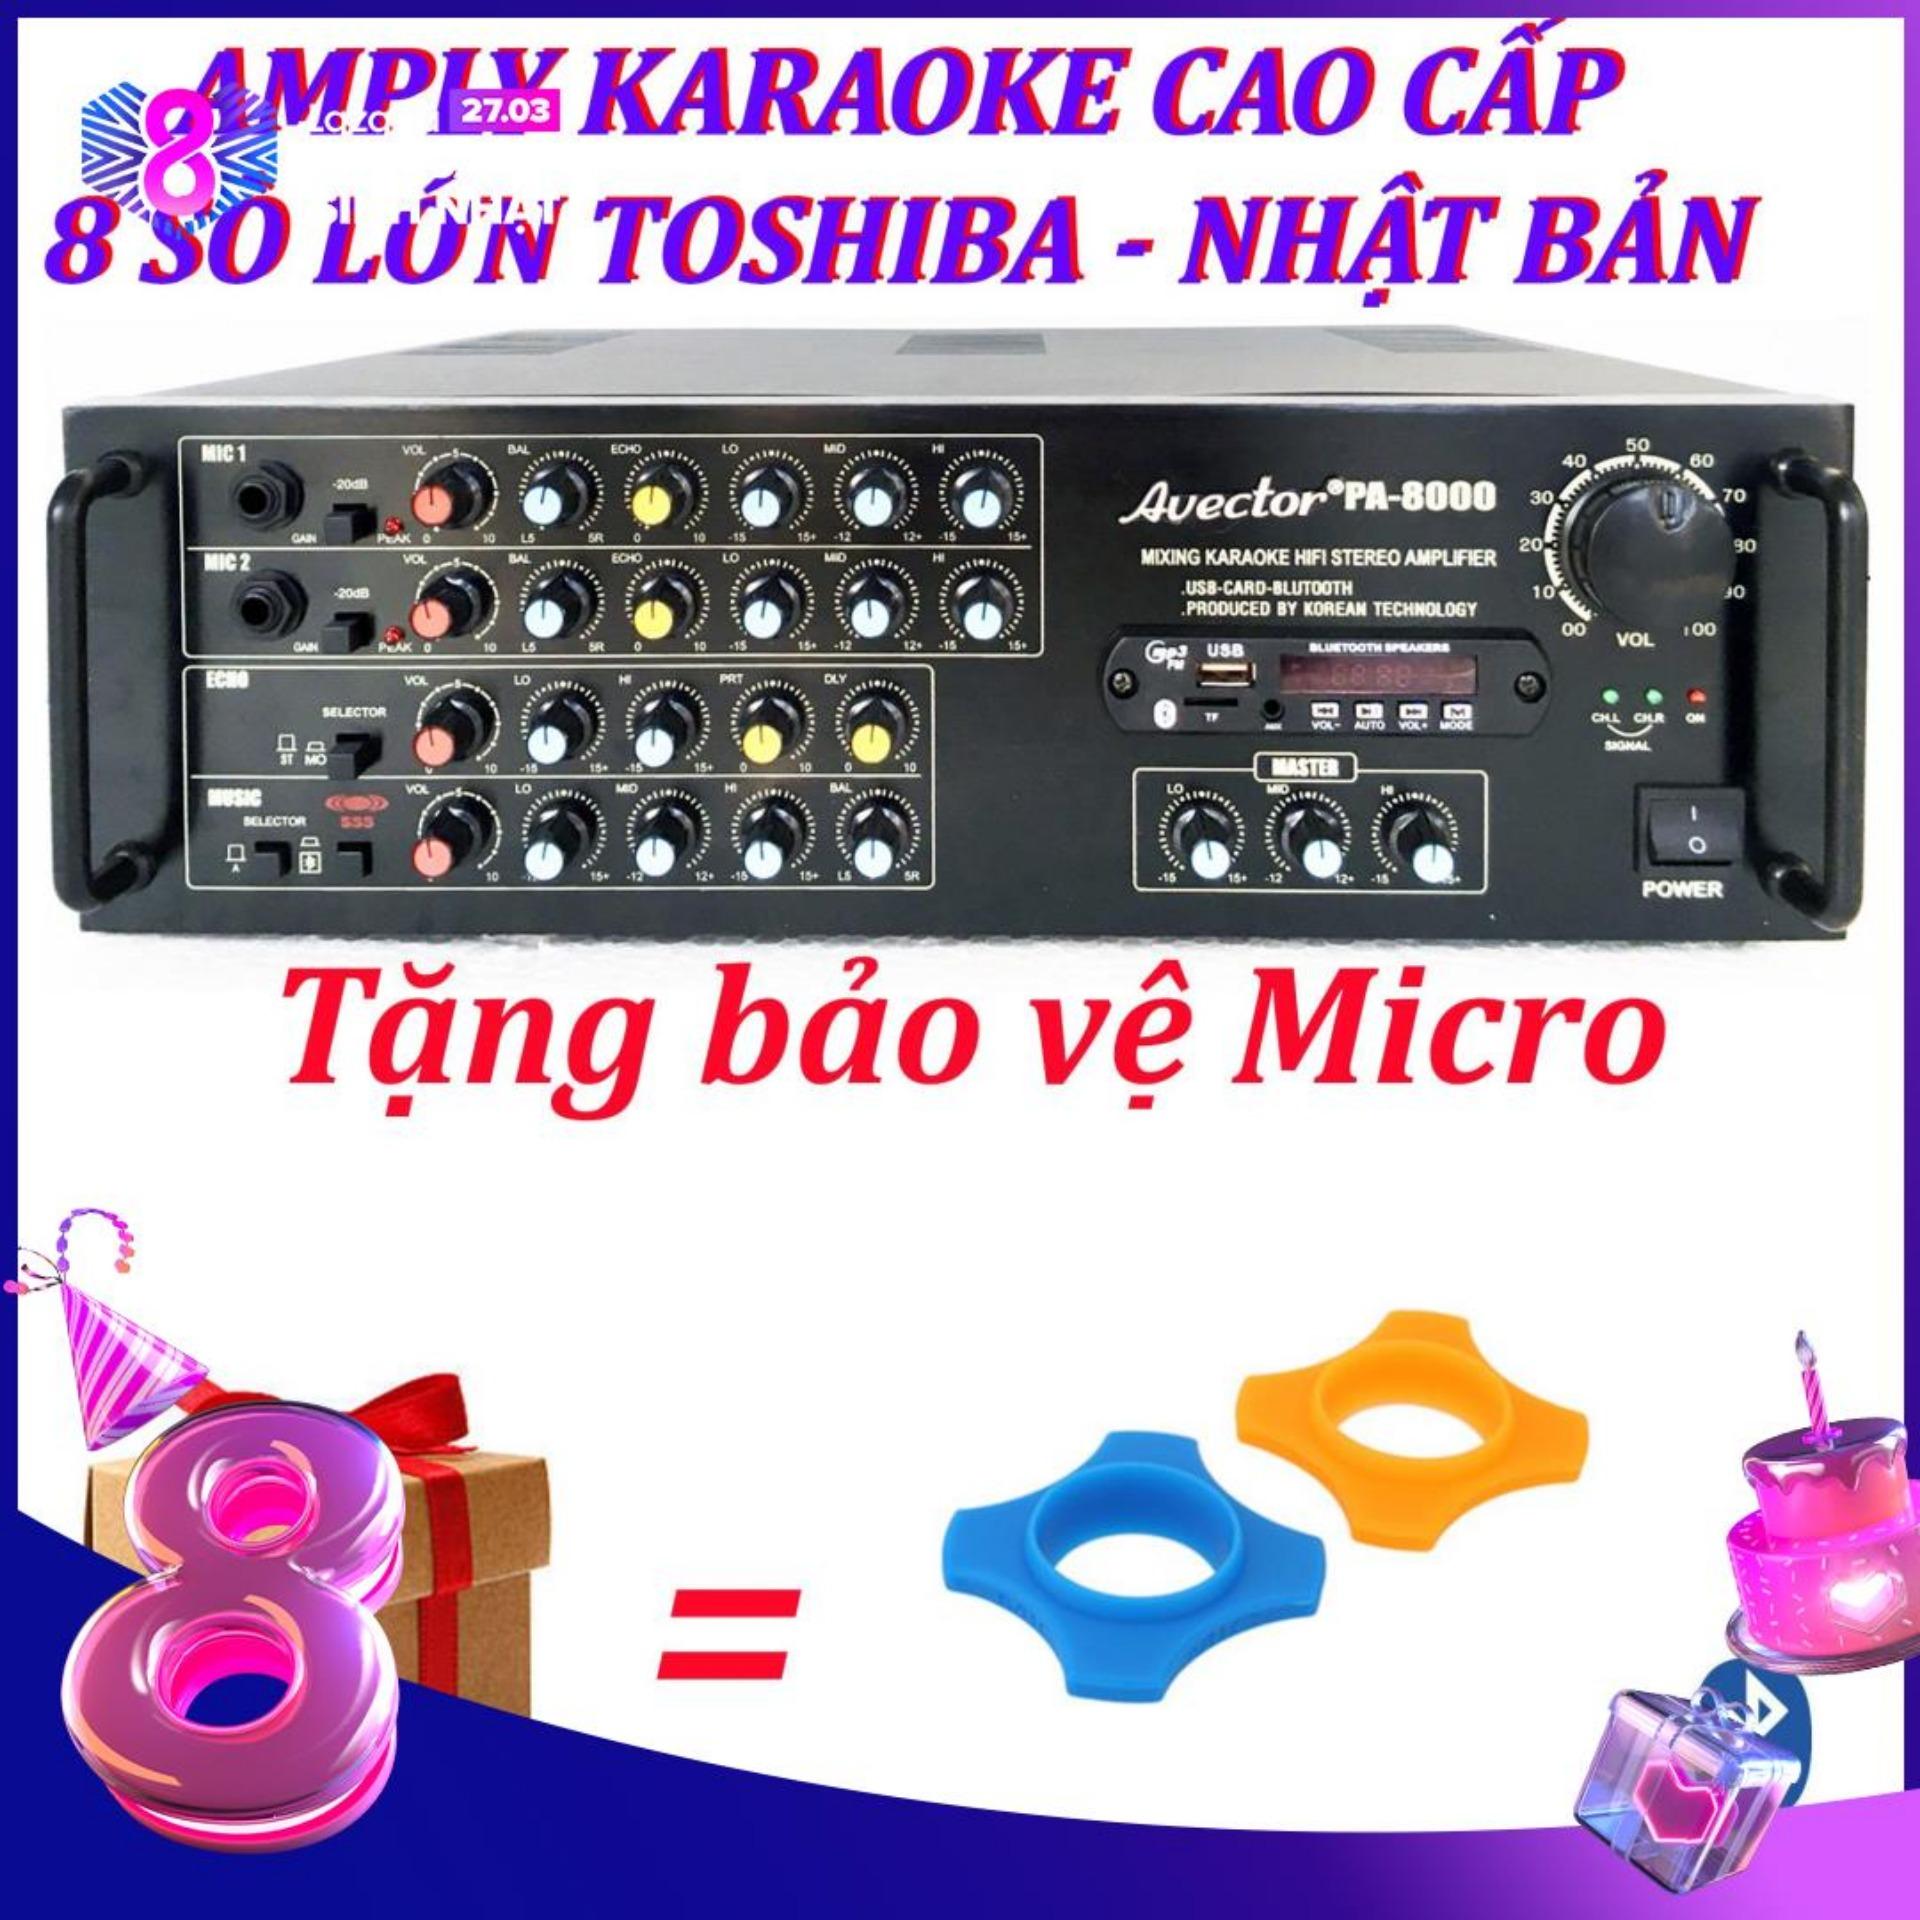 Amply karaoke ampli karaoke amply bluetooth nghe nhạc amply hat karaoke AVECTOR 8000 tặng 2 bảo vệ micro